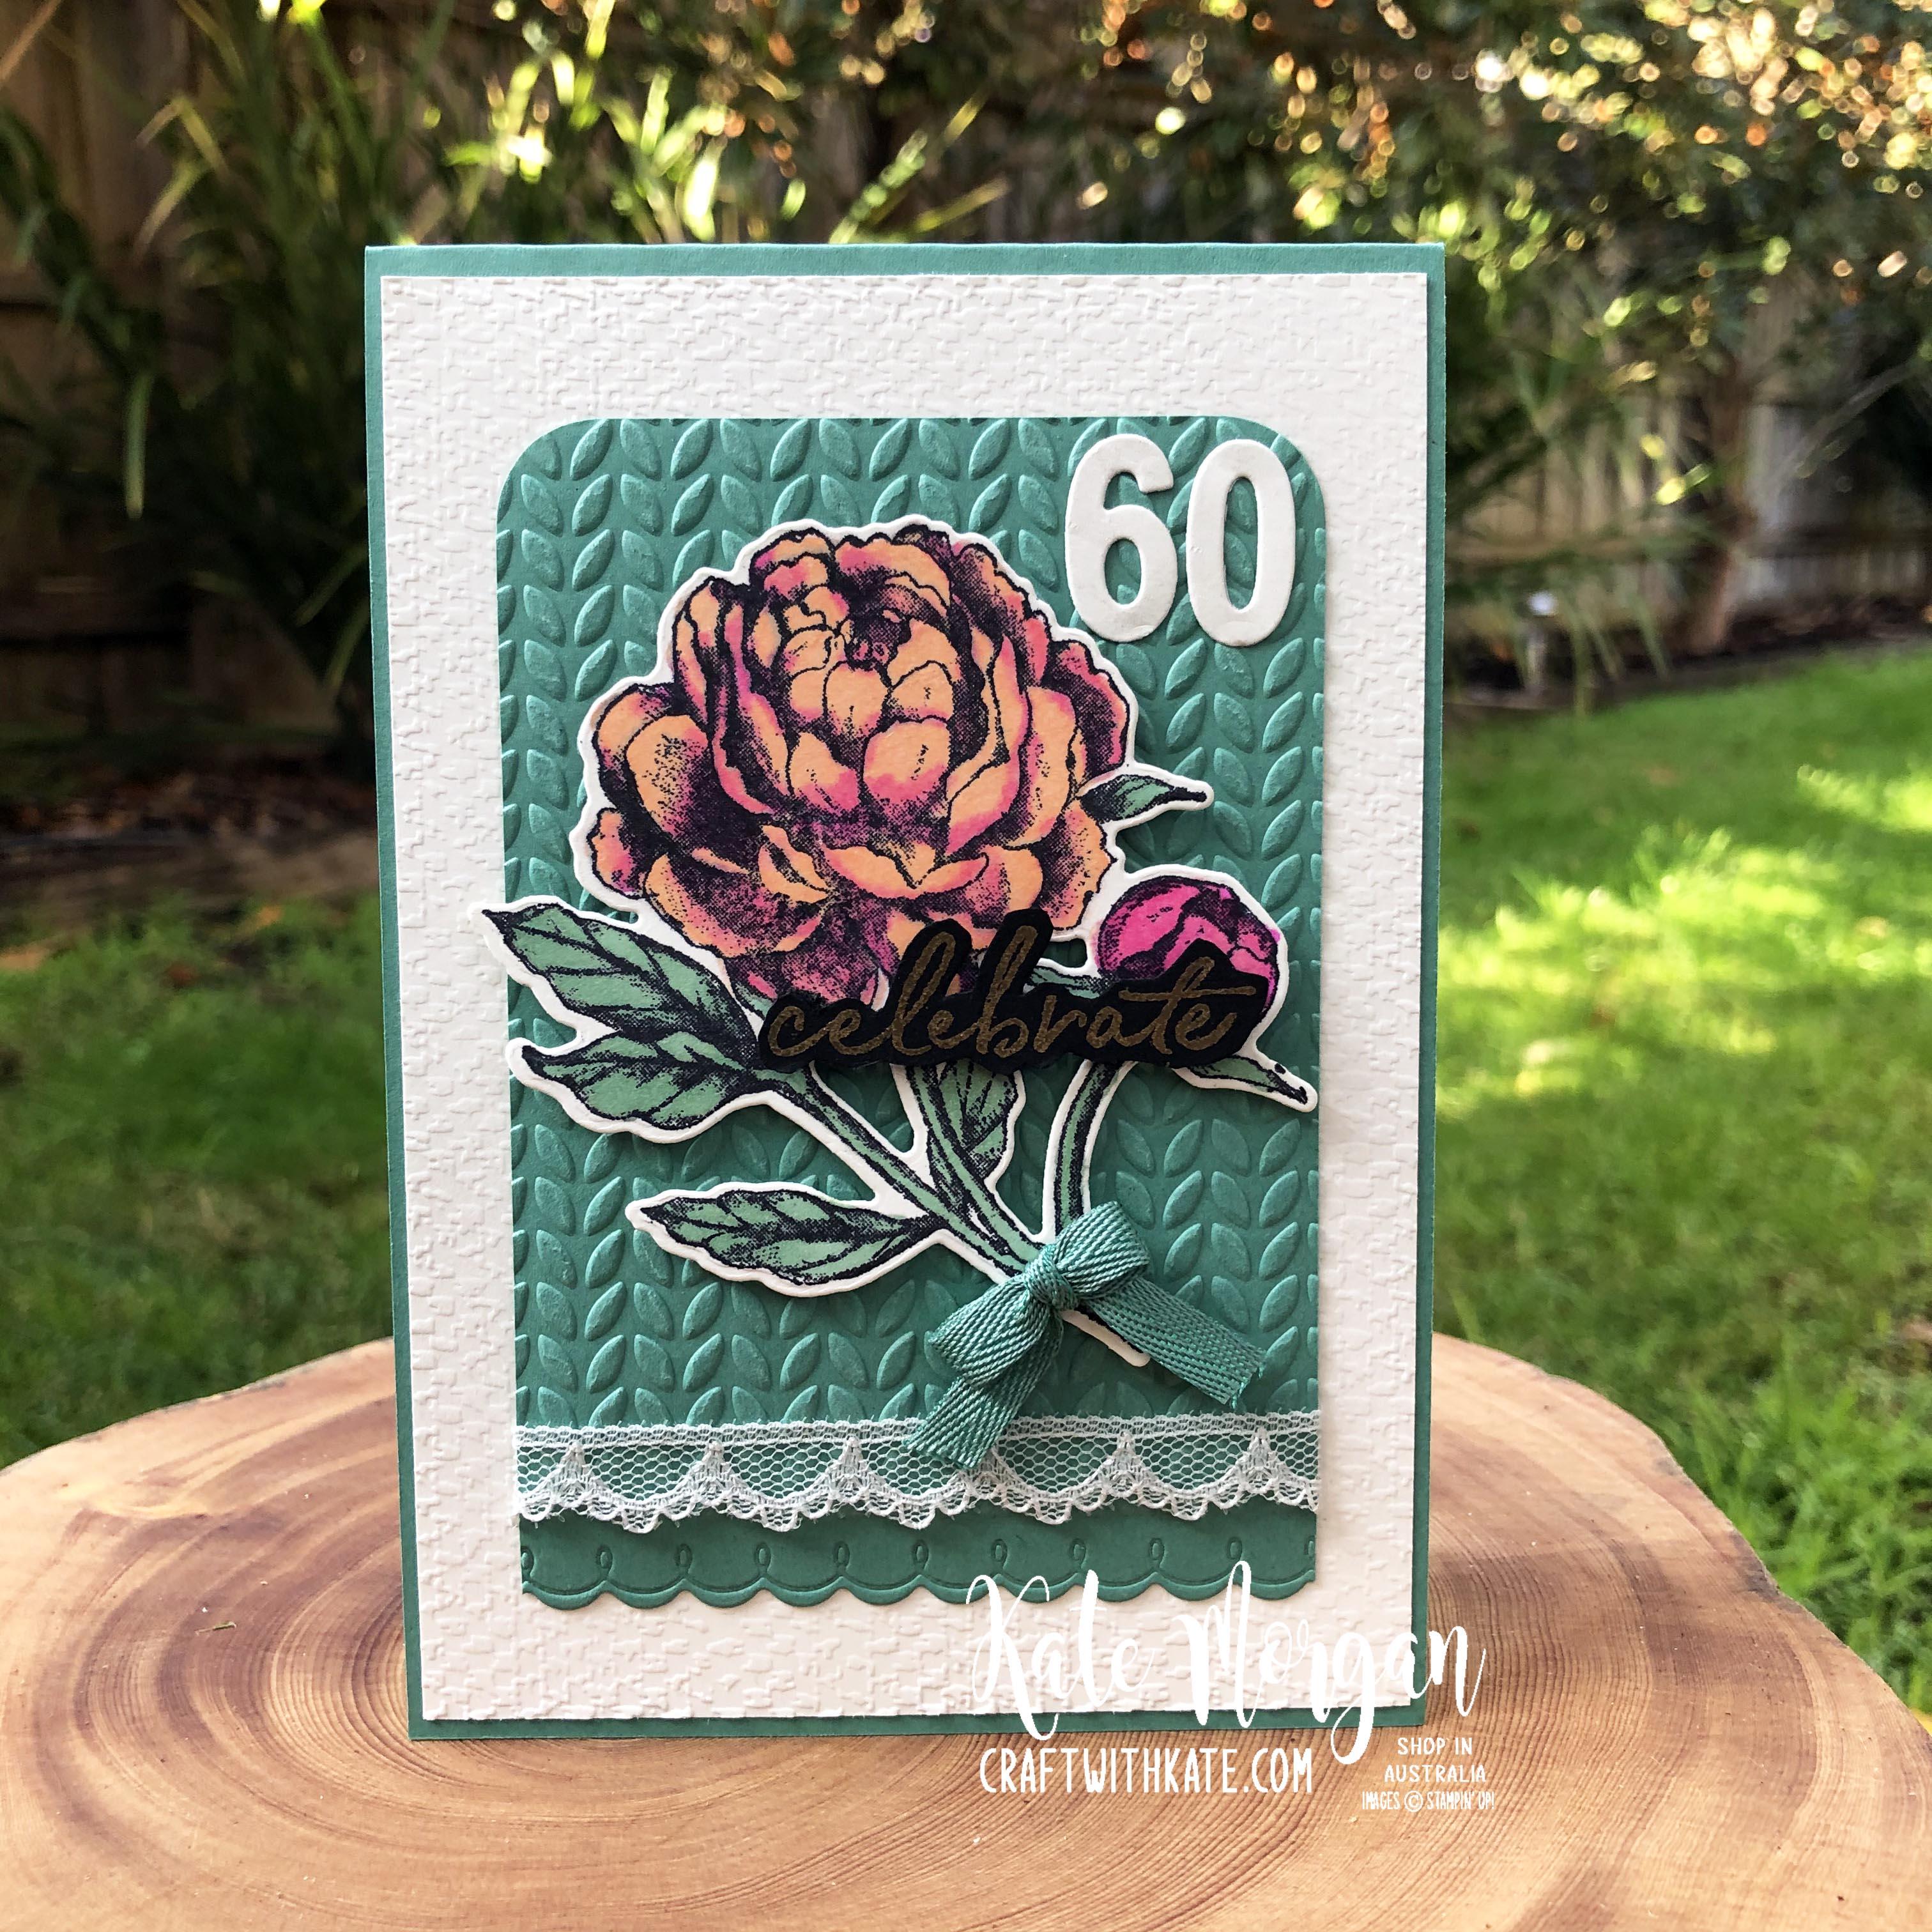 60th Feminine birthday card using Prized Peony by Kate Morgan Stampin Up Australia 2020.